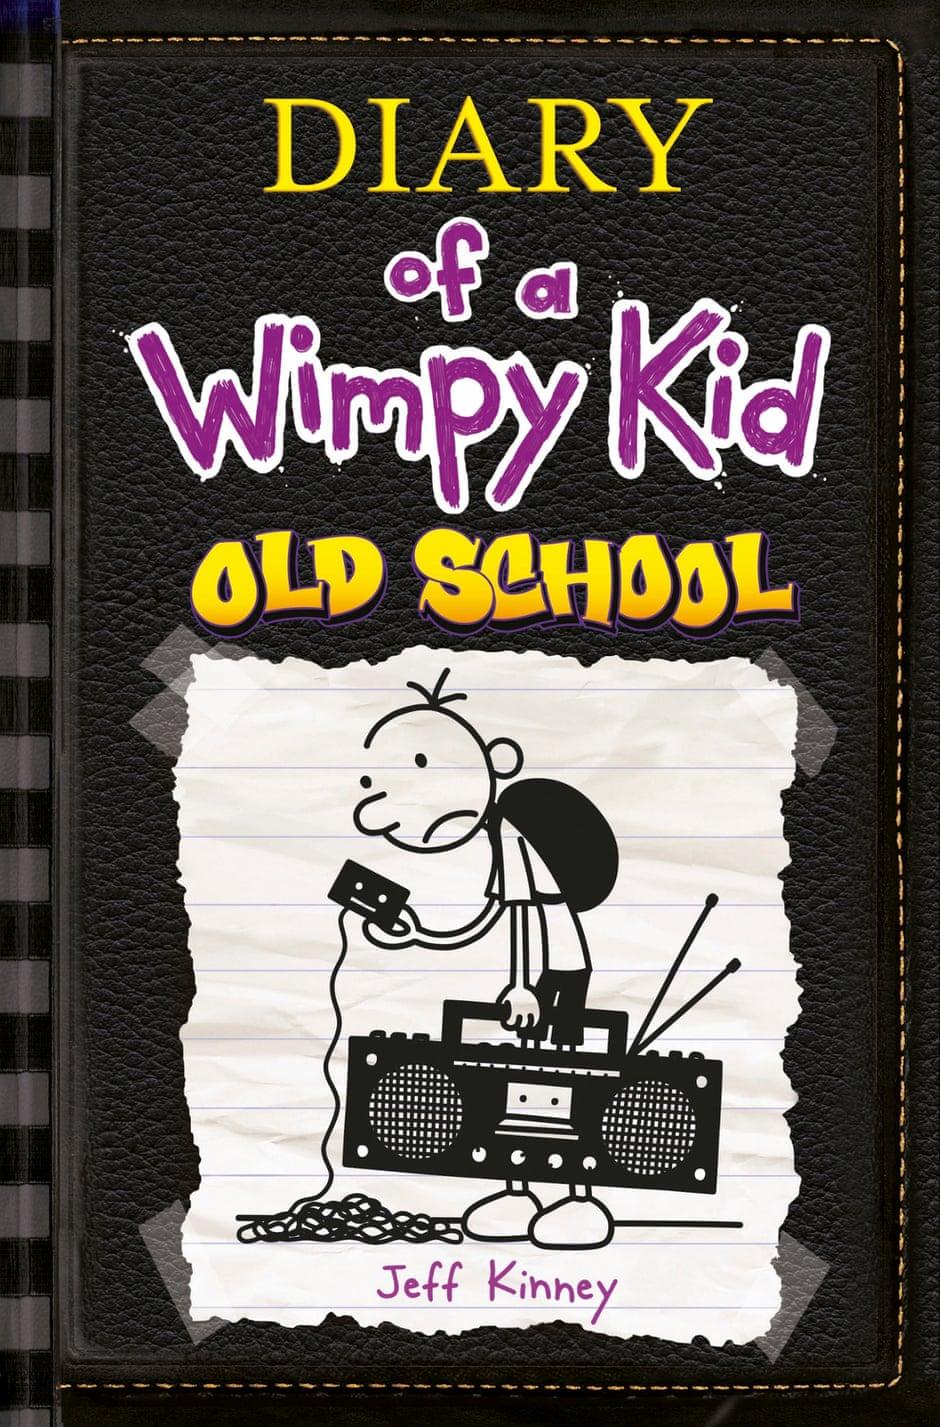 WImpy Kid old school